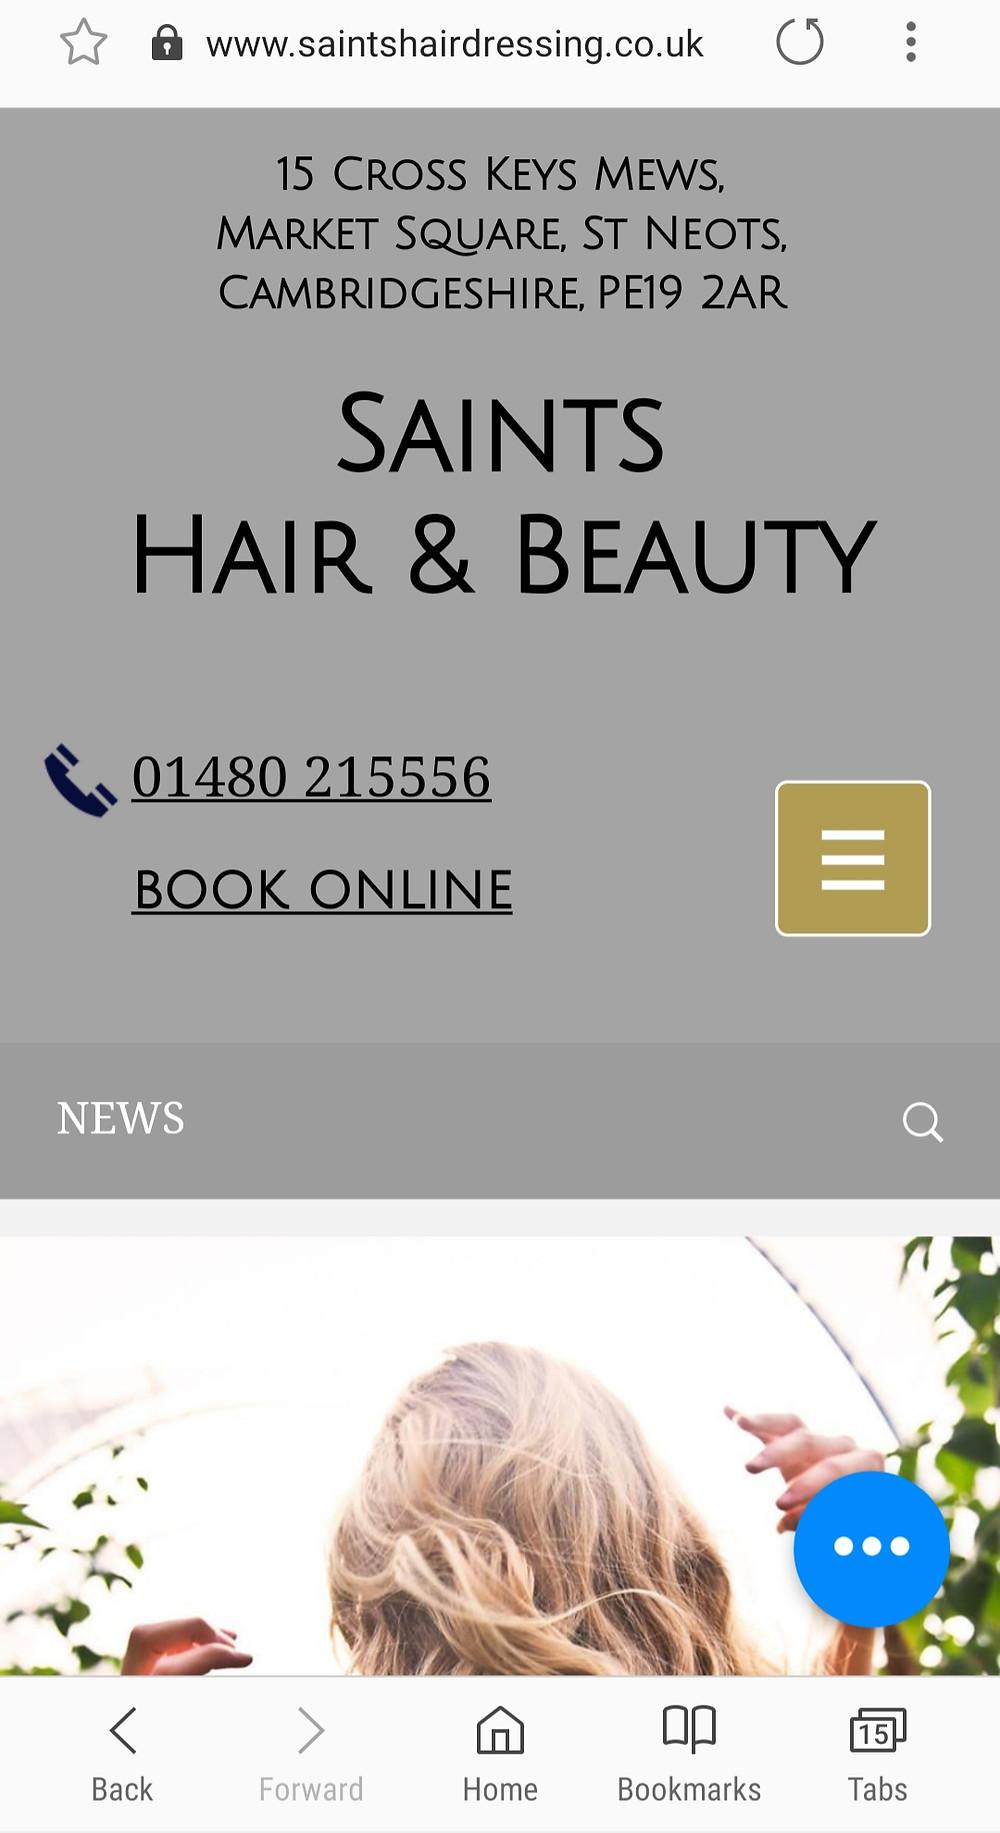 mobile, saints, hair, st neots, beauty, SEO